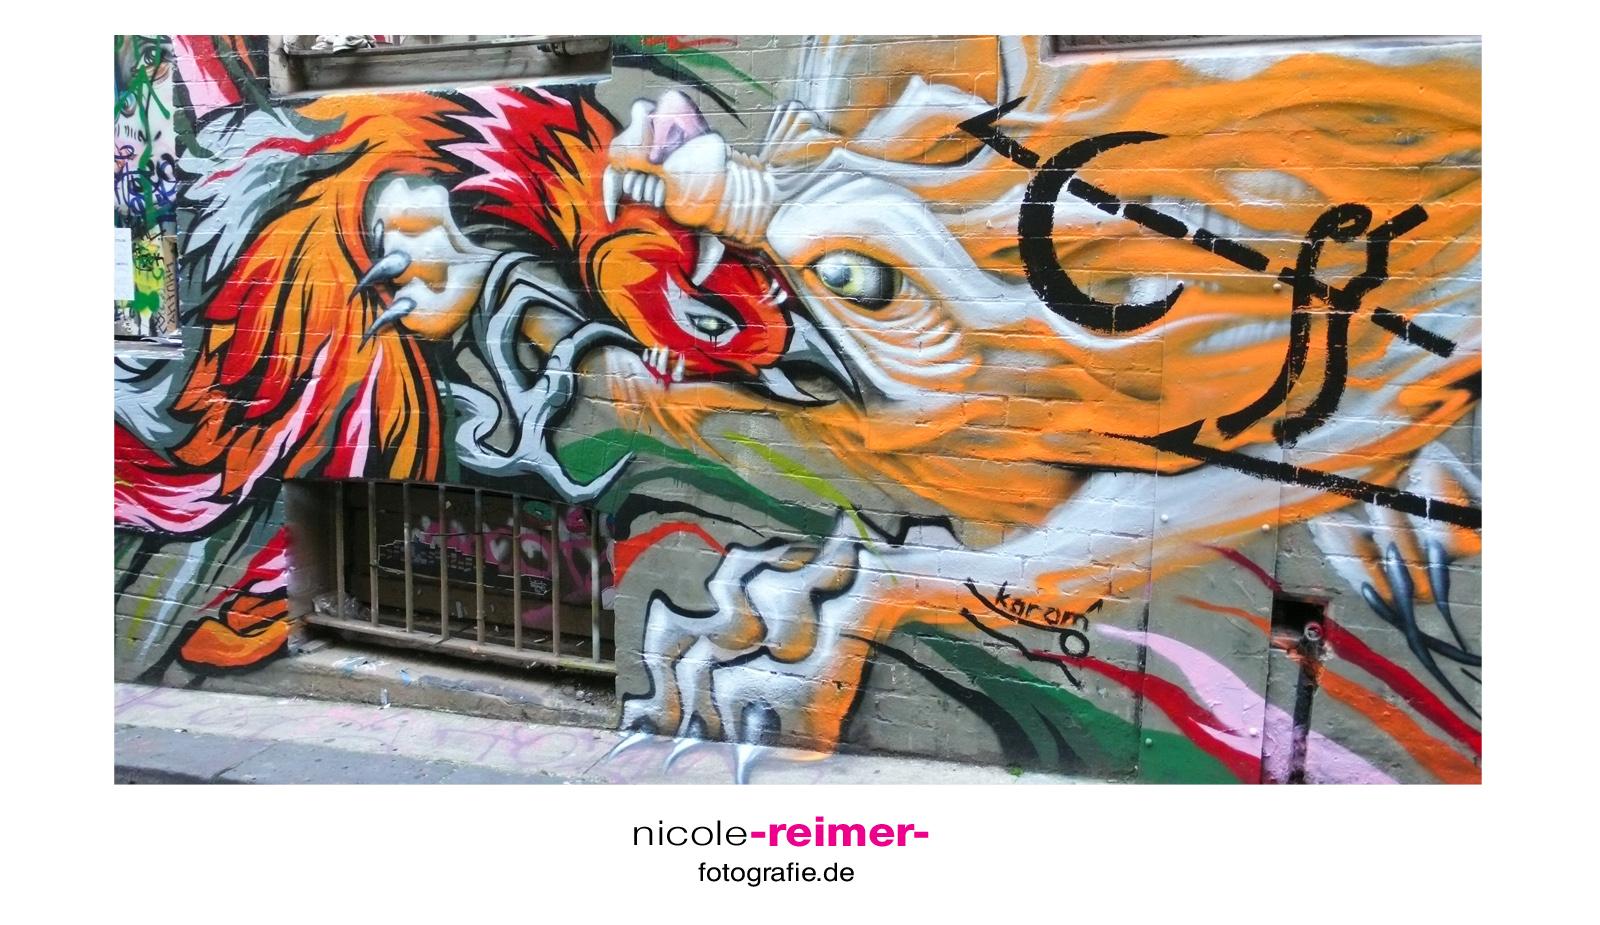 Nicole_Reimer_Fotografie_Street_Art_Melbourne_6